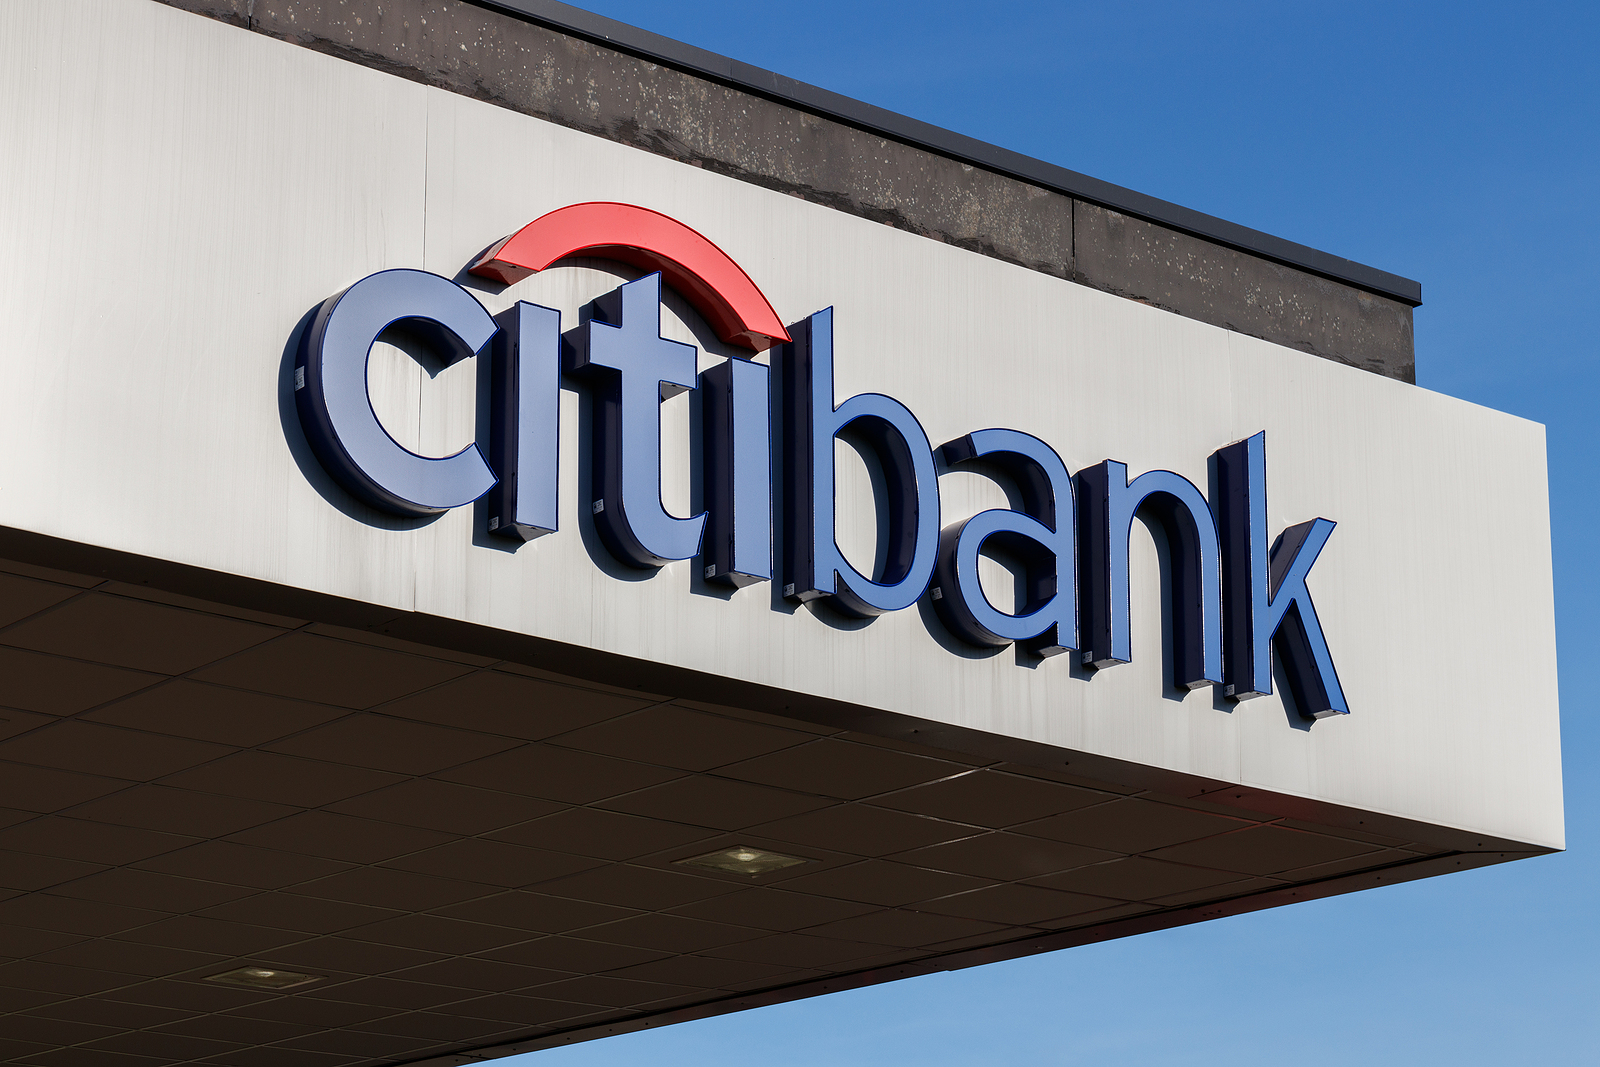 Citibank C stock news and analysis